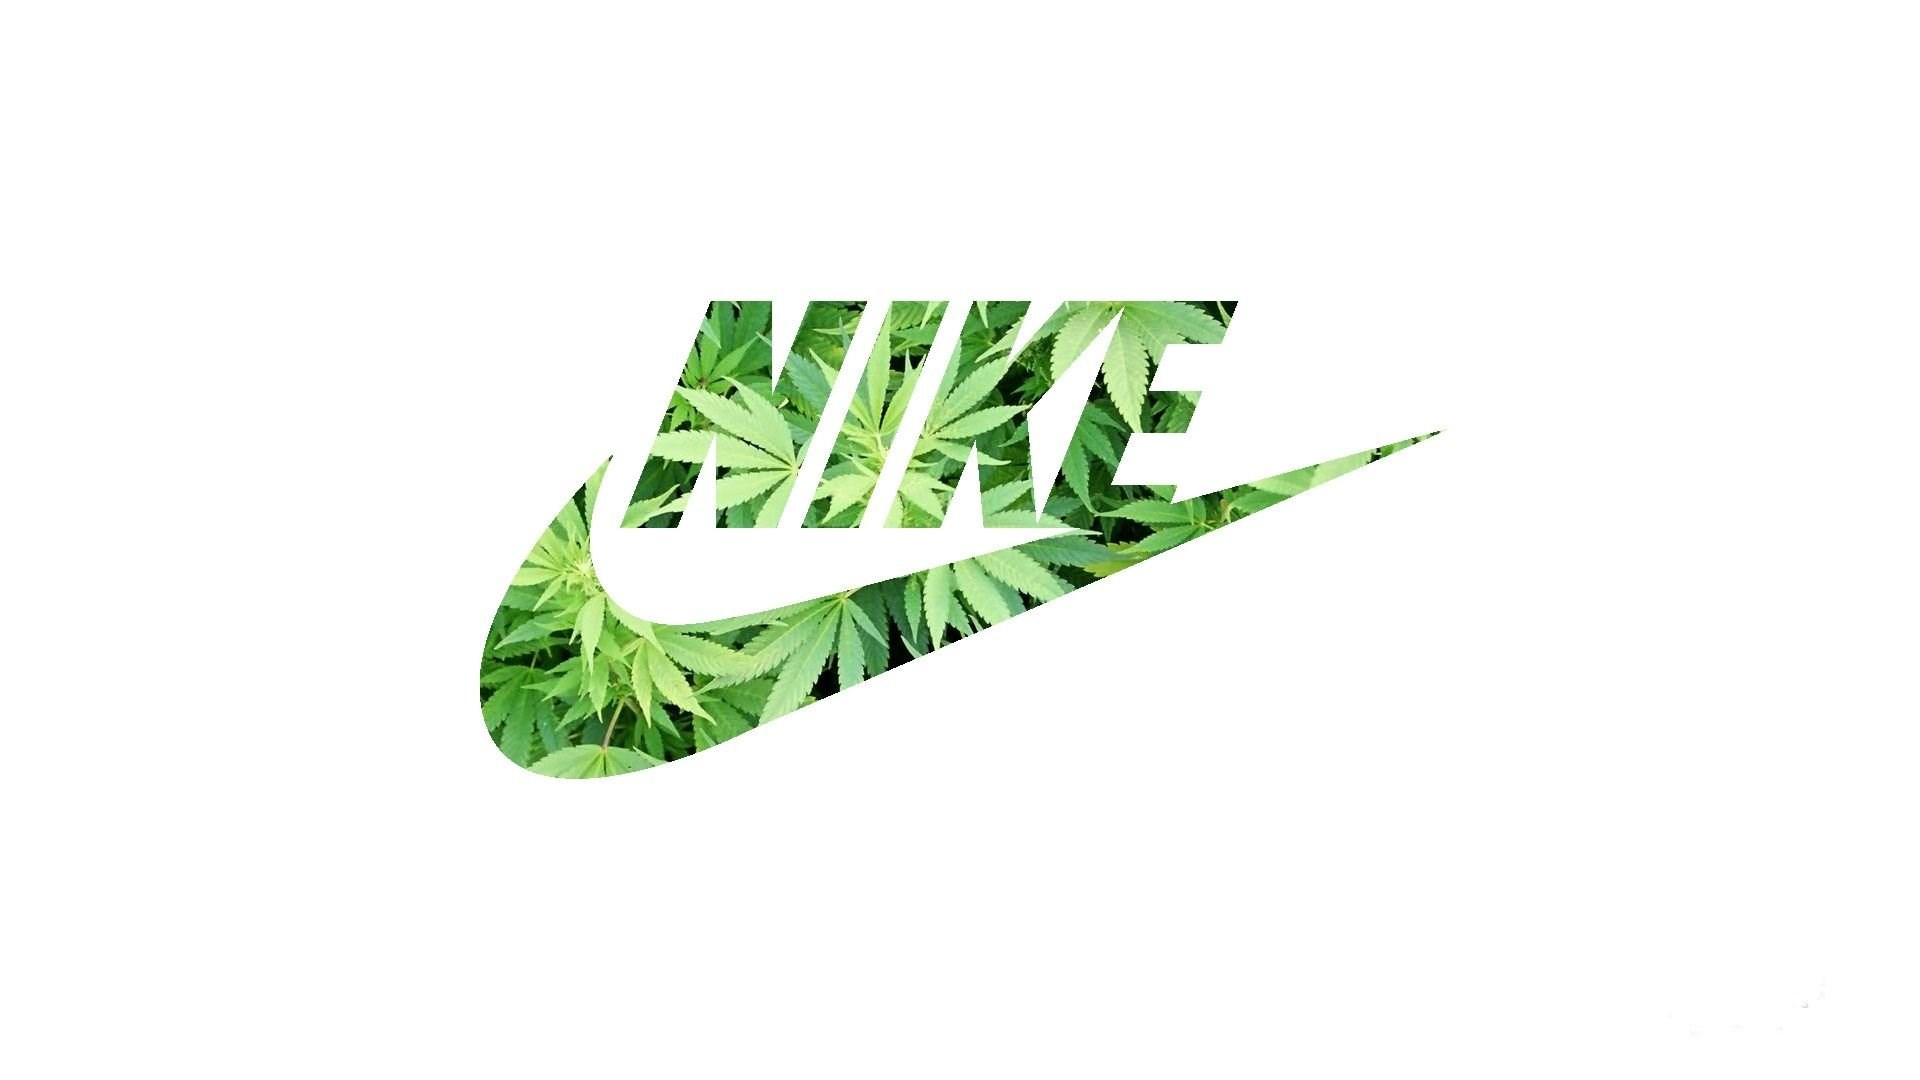 Nike Wallpapers Tumblr Widescreen Desktop Background